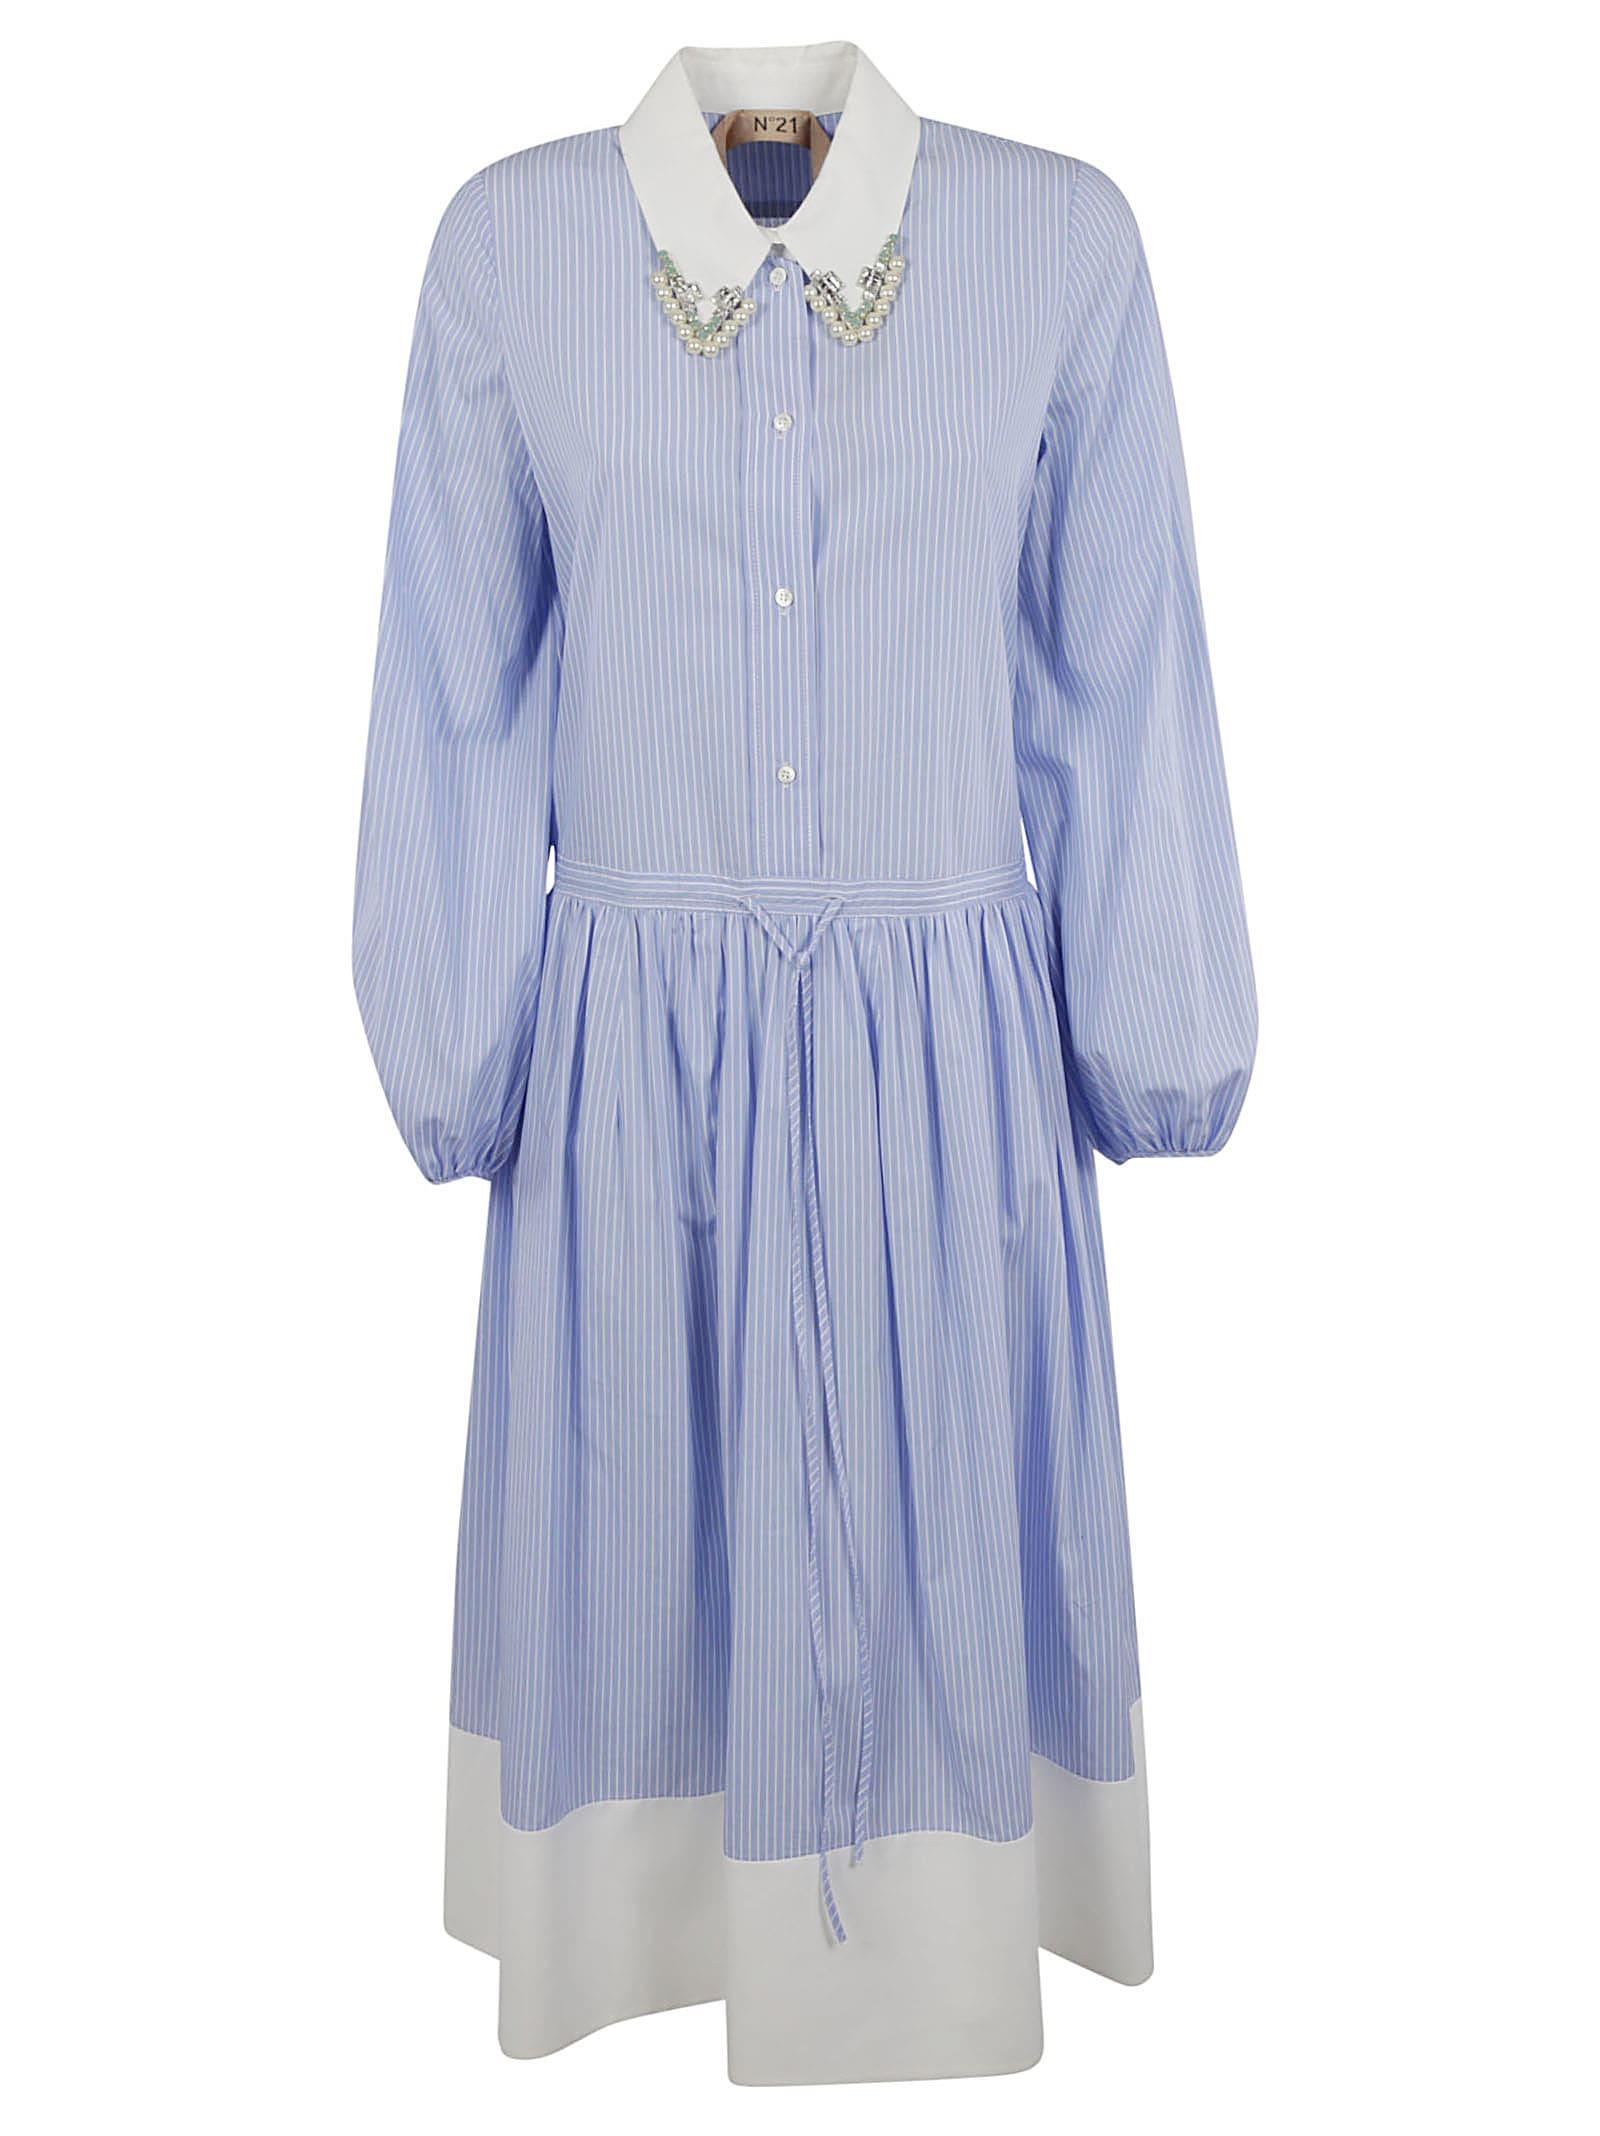 Buy N.21 Stripe Print Collar-embellished Dress online, shop N.21 with free shipping